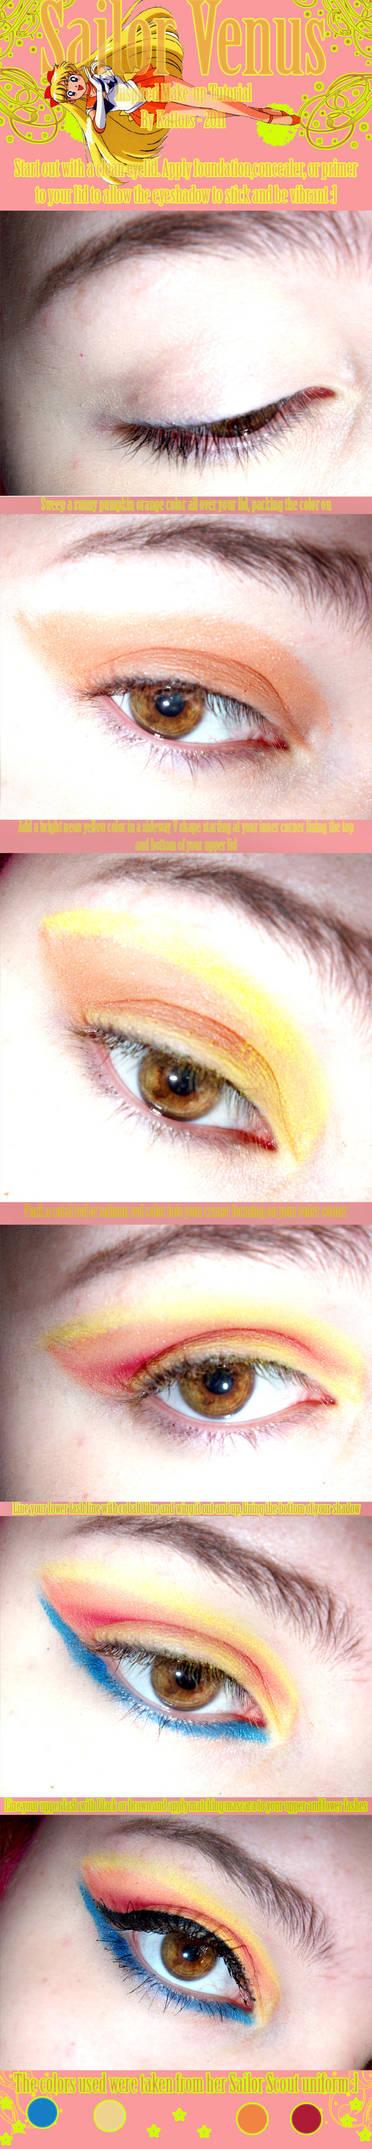 Sailor Venus Makeup Tutorial by kattors